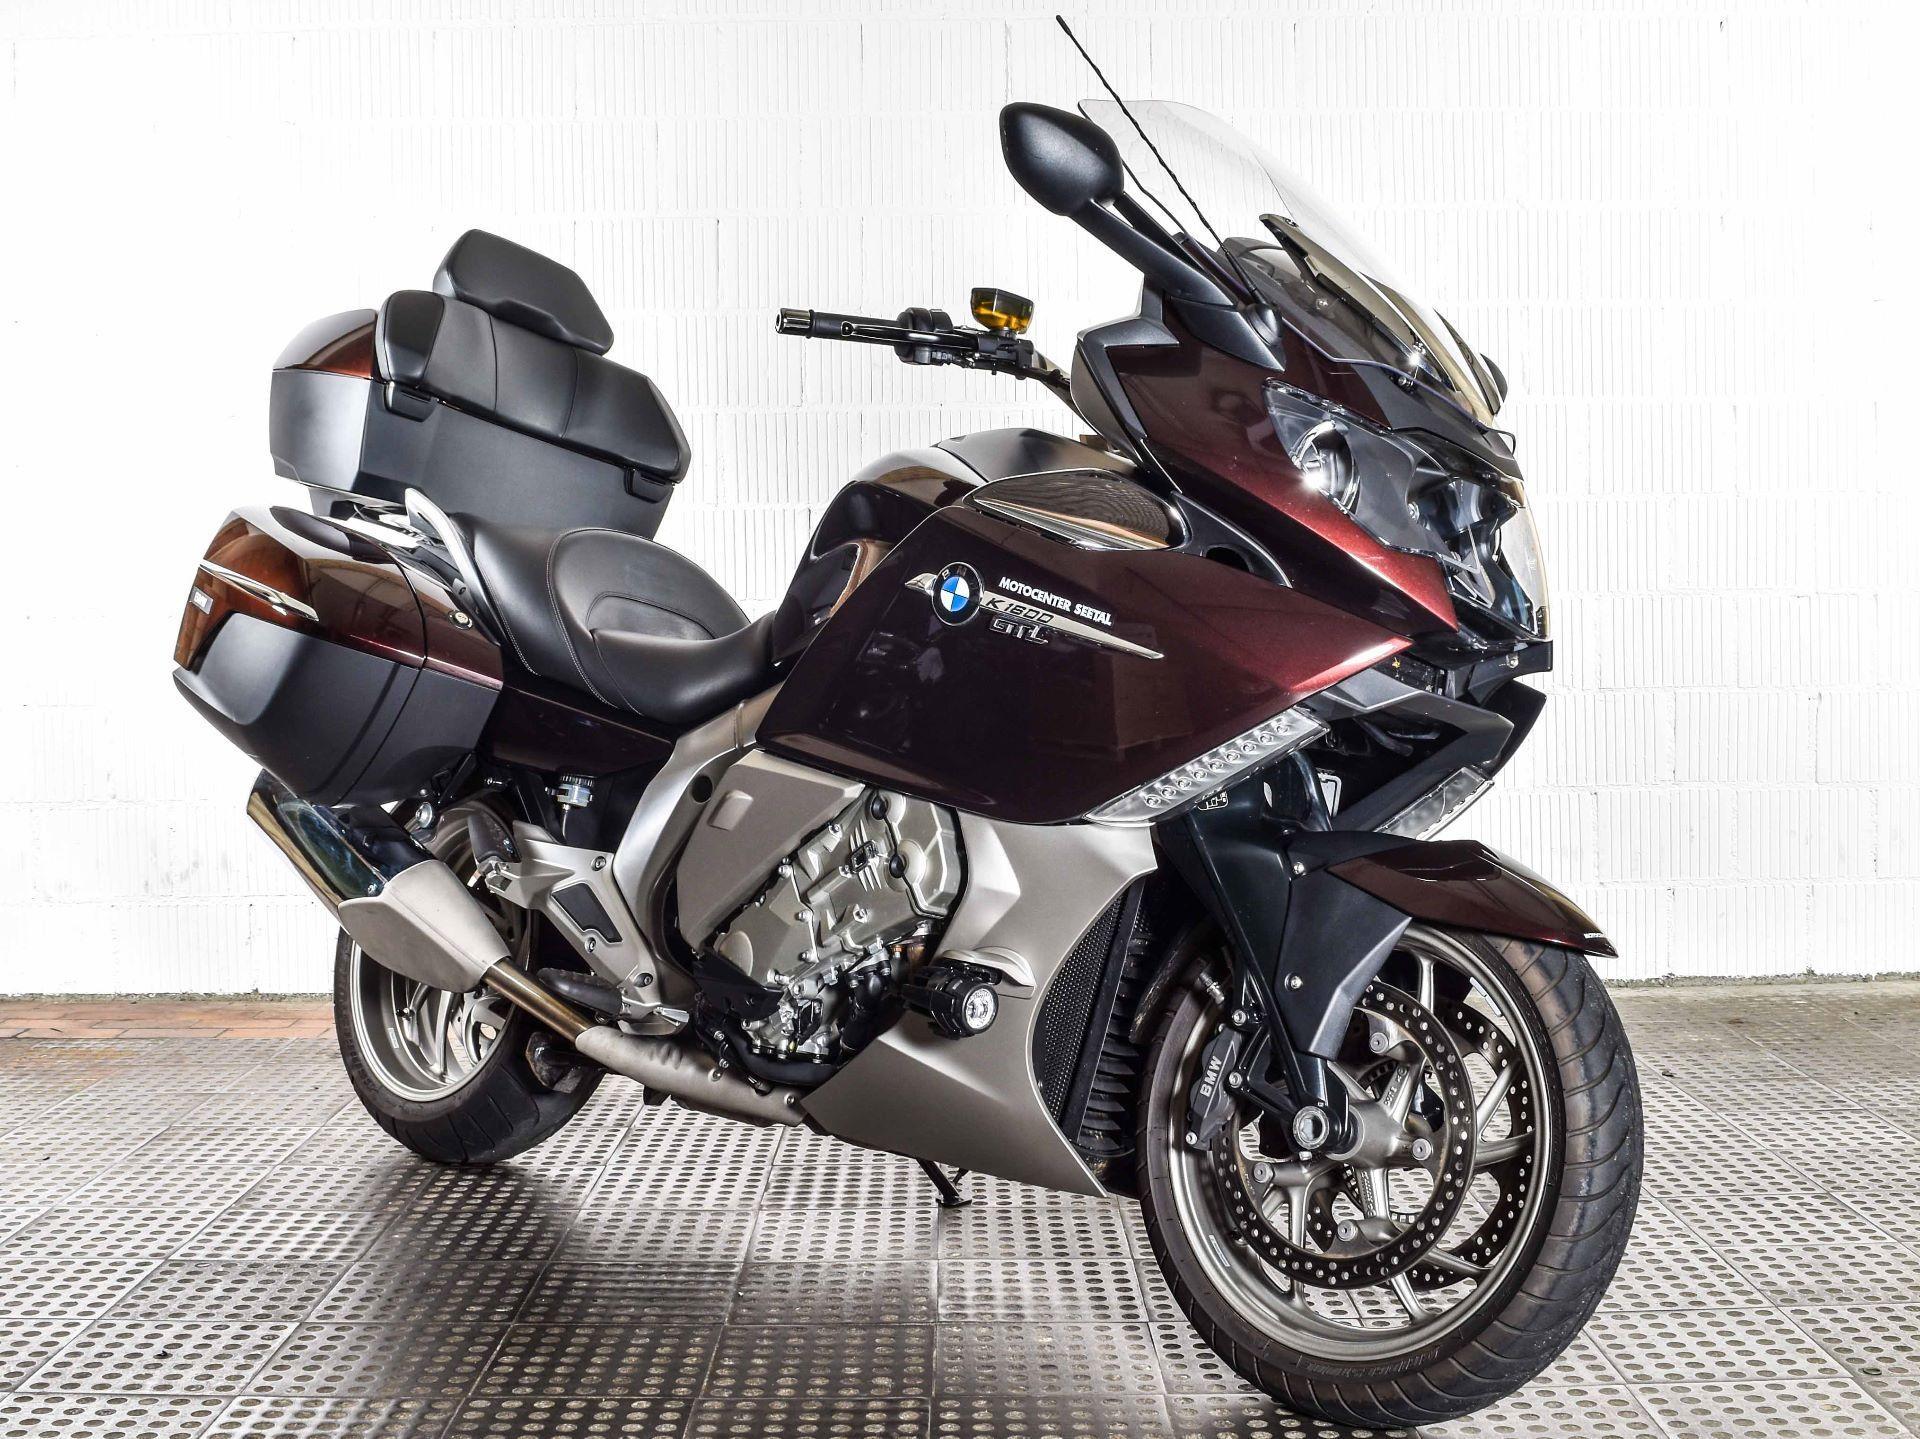 motorrad occasion kaufen bmw k 1600 gtl abs motocenter seetal ballwil. Black Bedroom Furniture Sets. Home Design Ideas